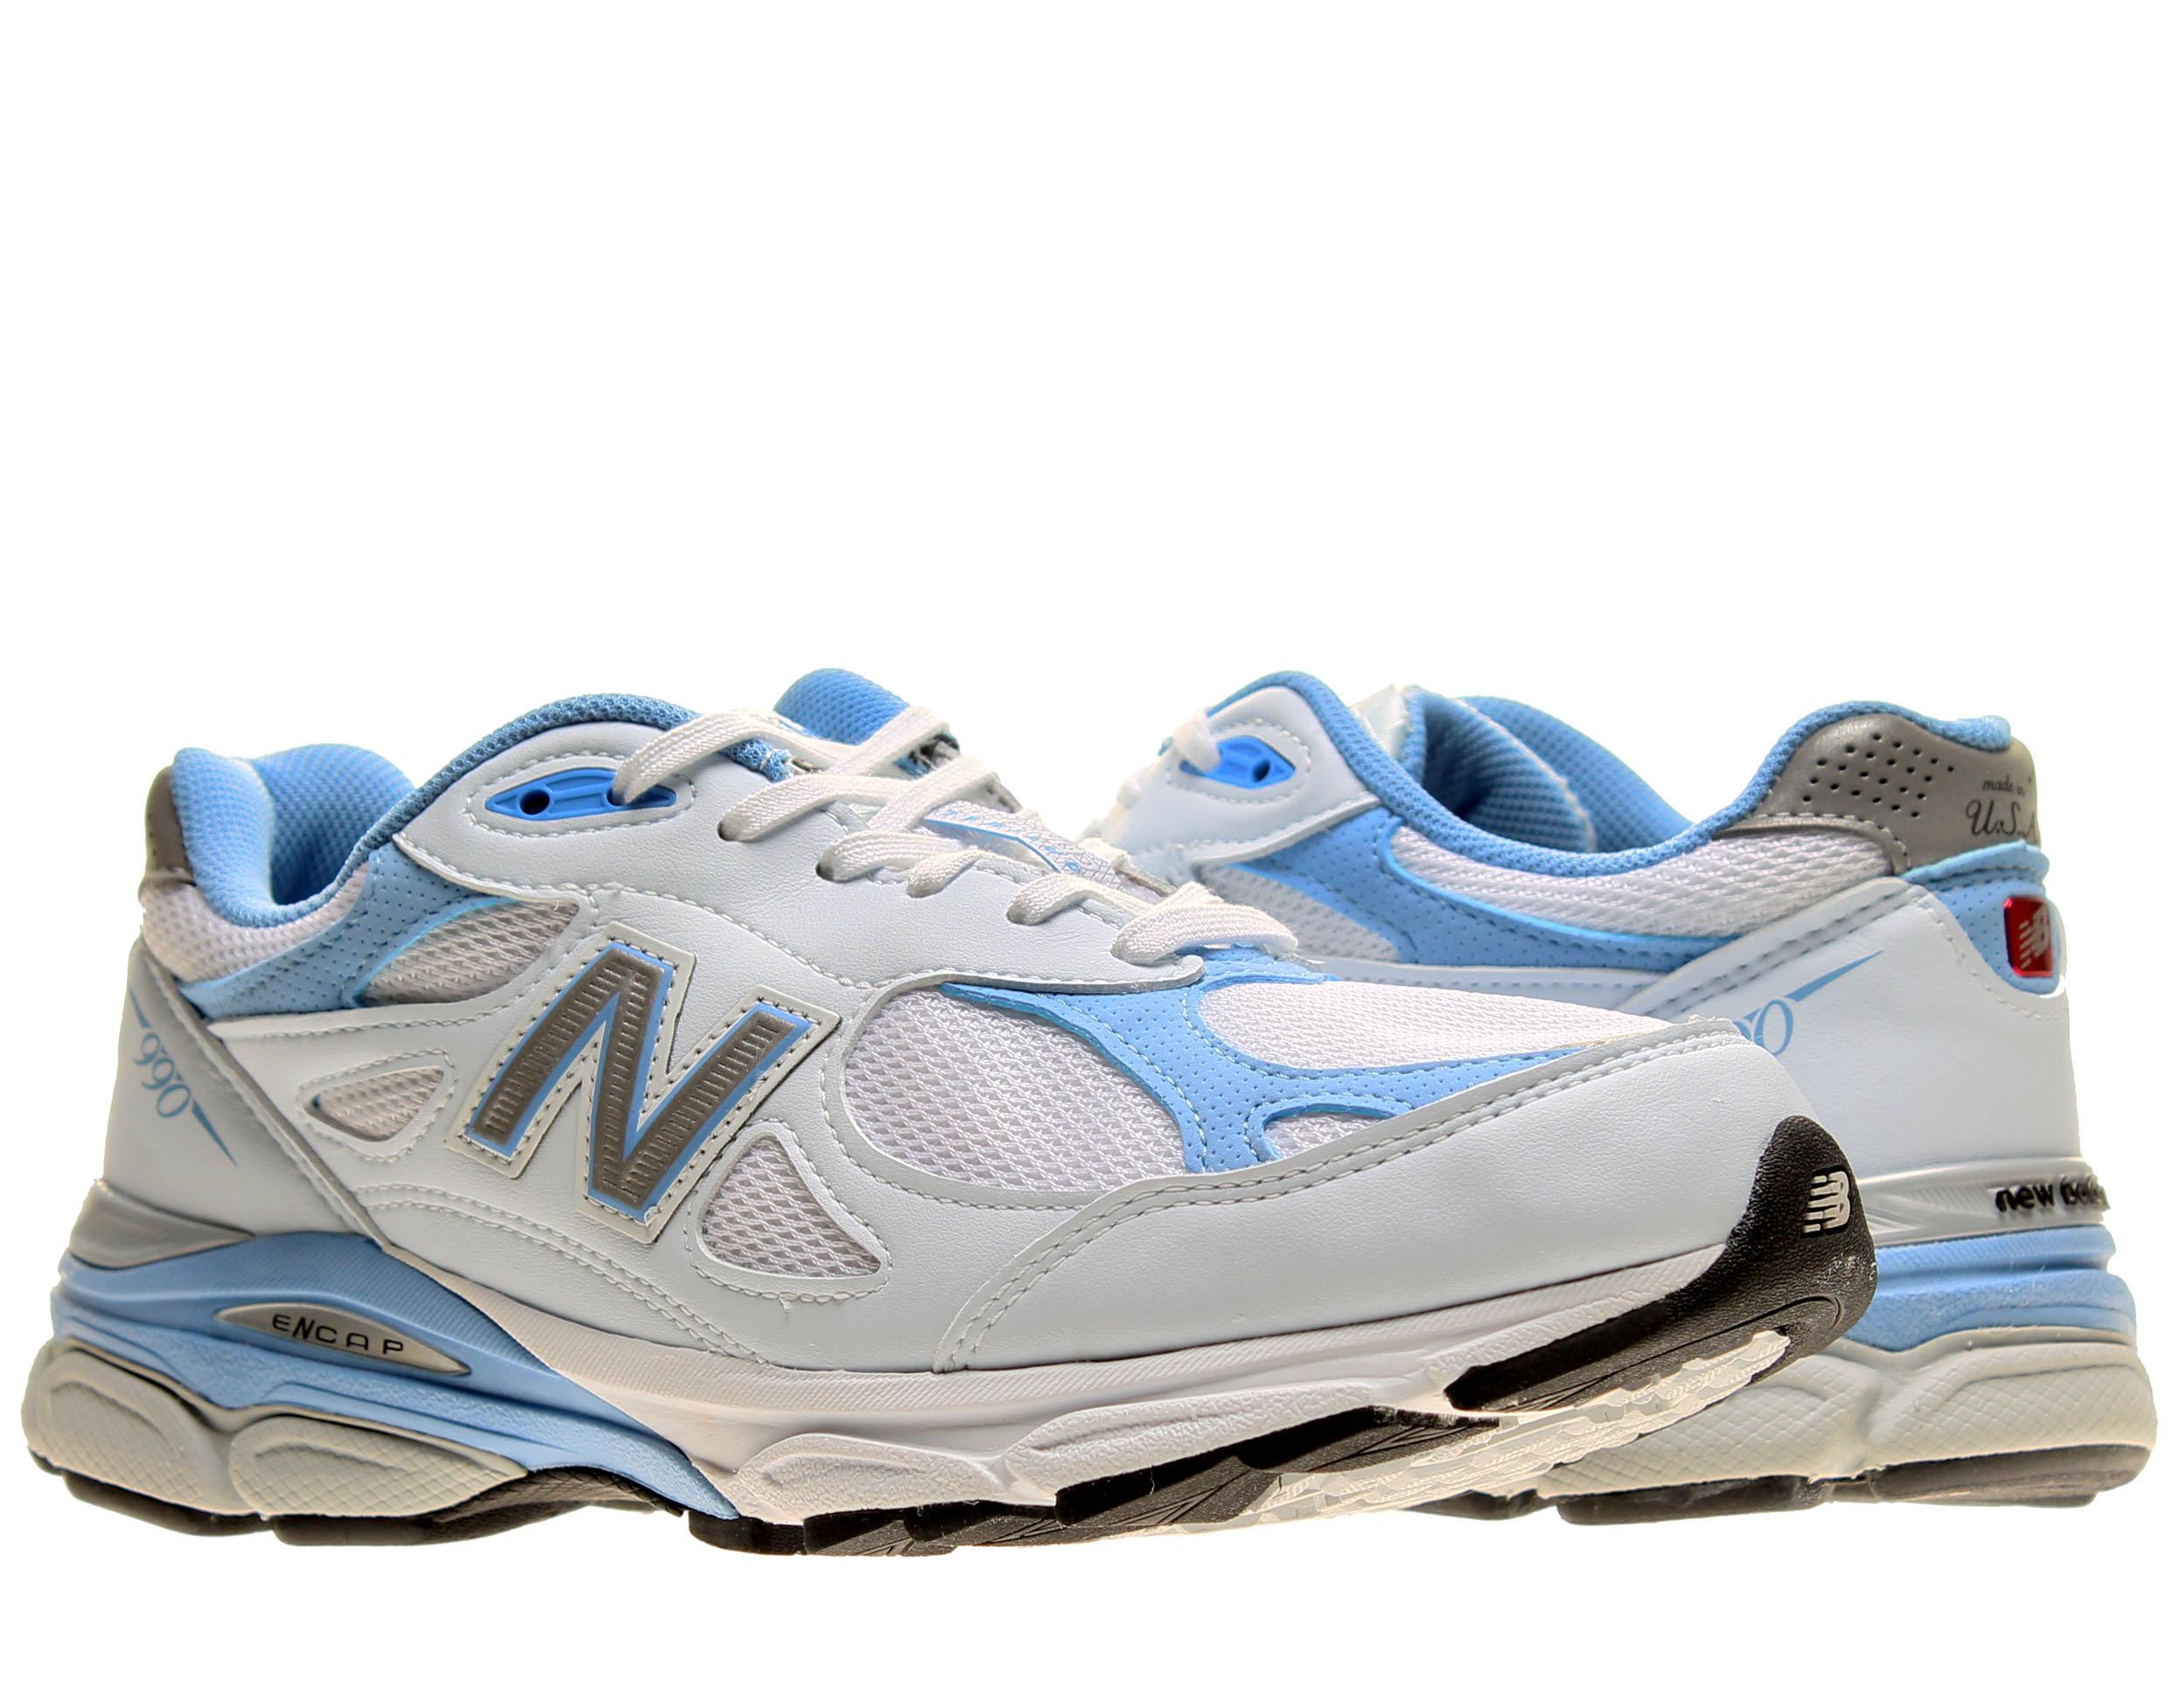 New Balance 990v3 Blanc/Bleu Femme Chaussures De Course W990WB3 ...